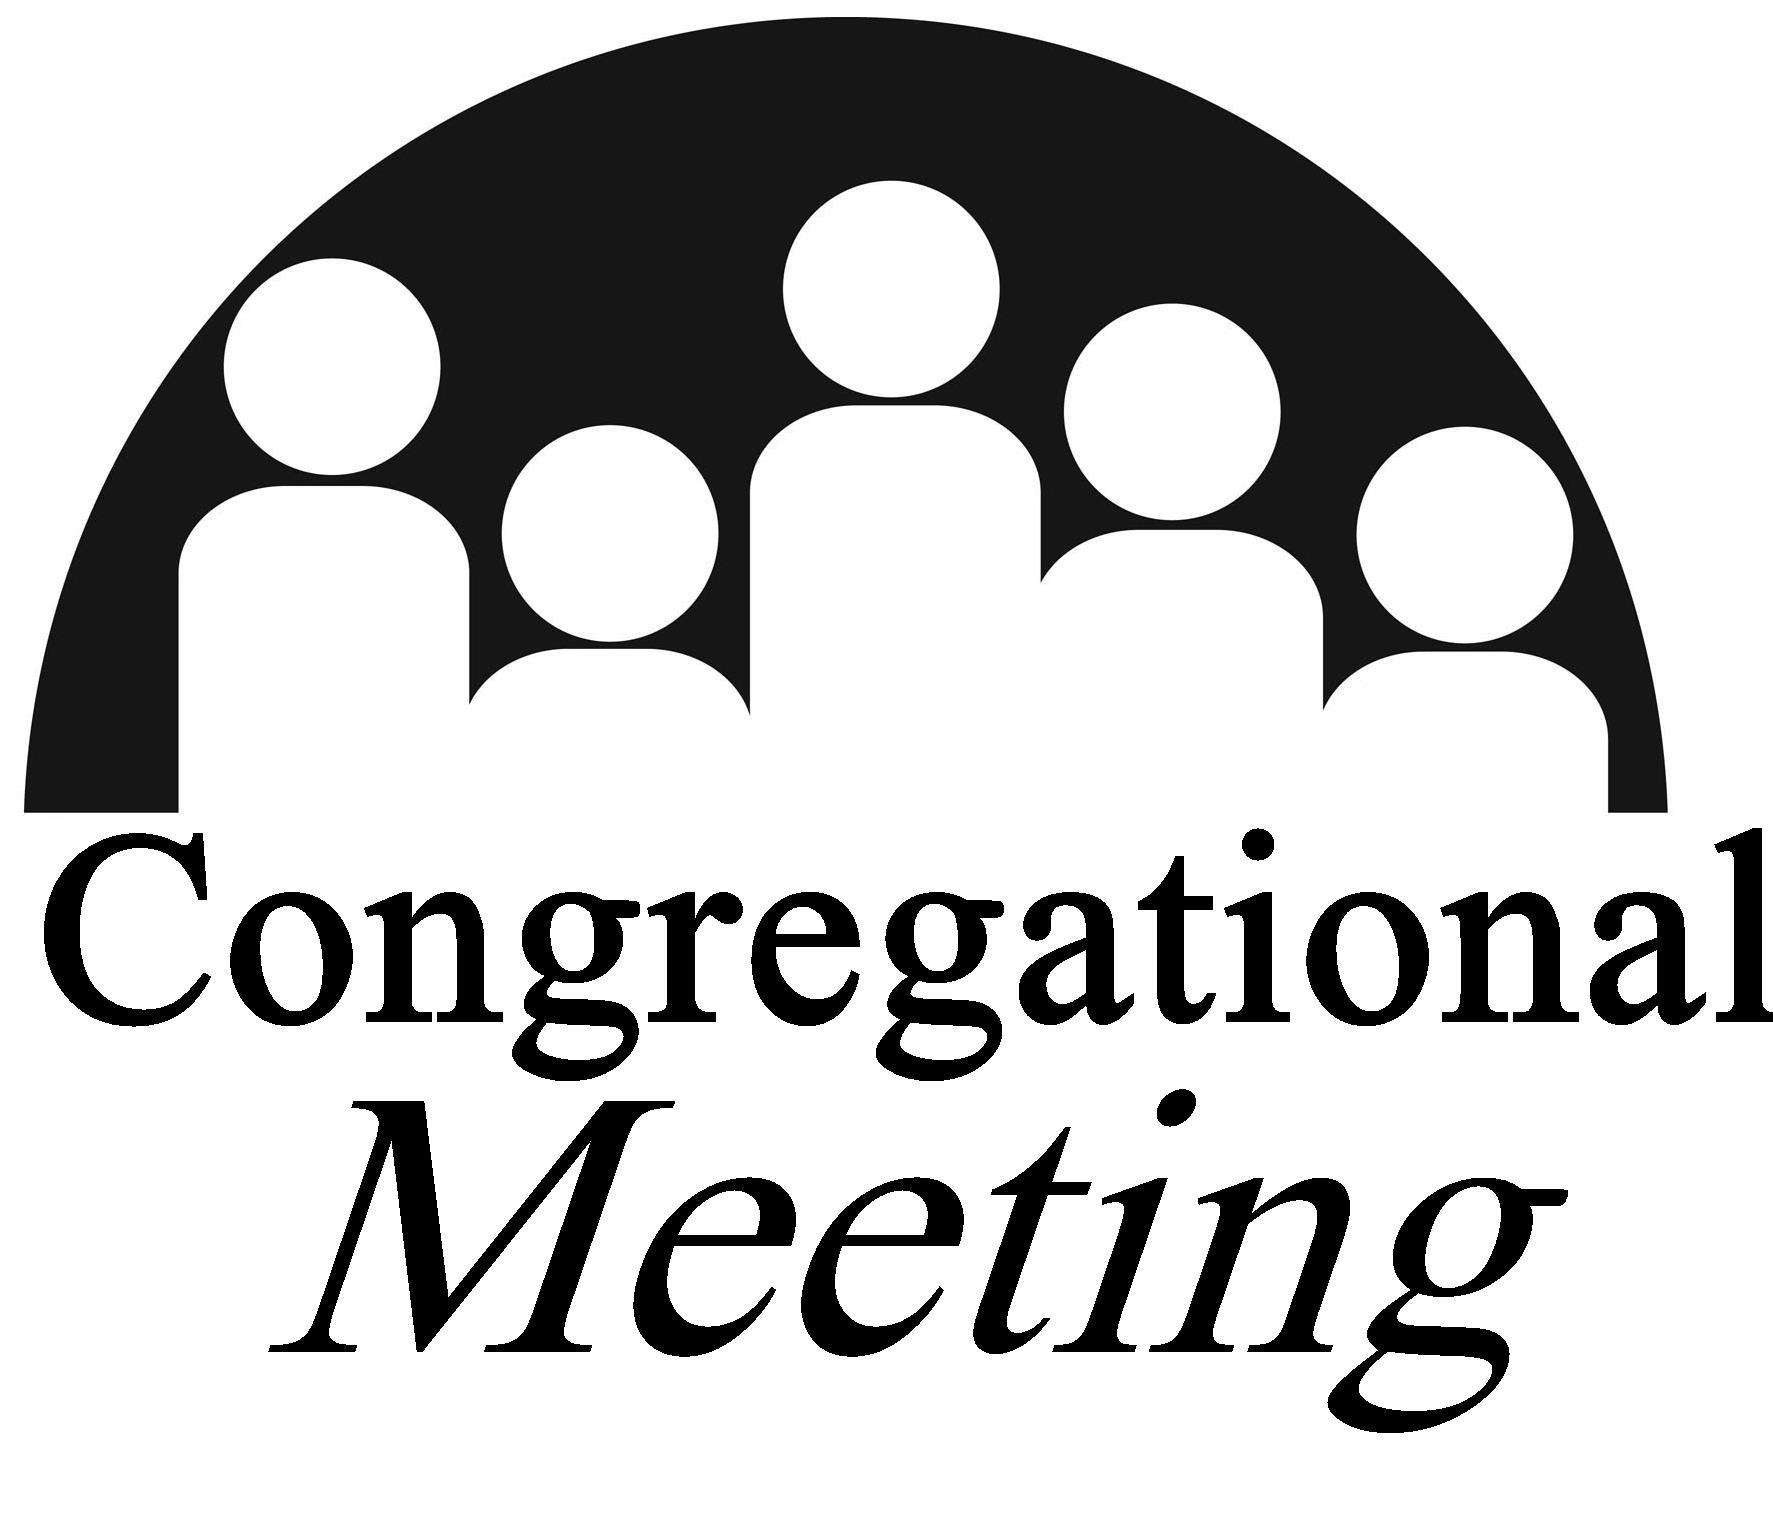 cong meeting1.jpg